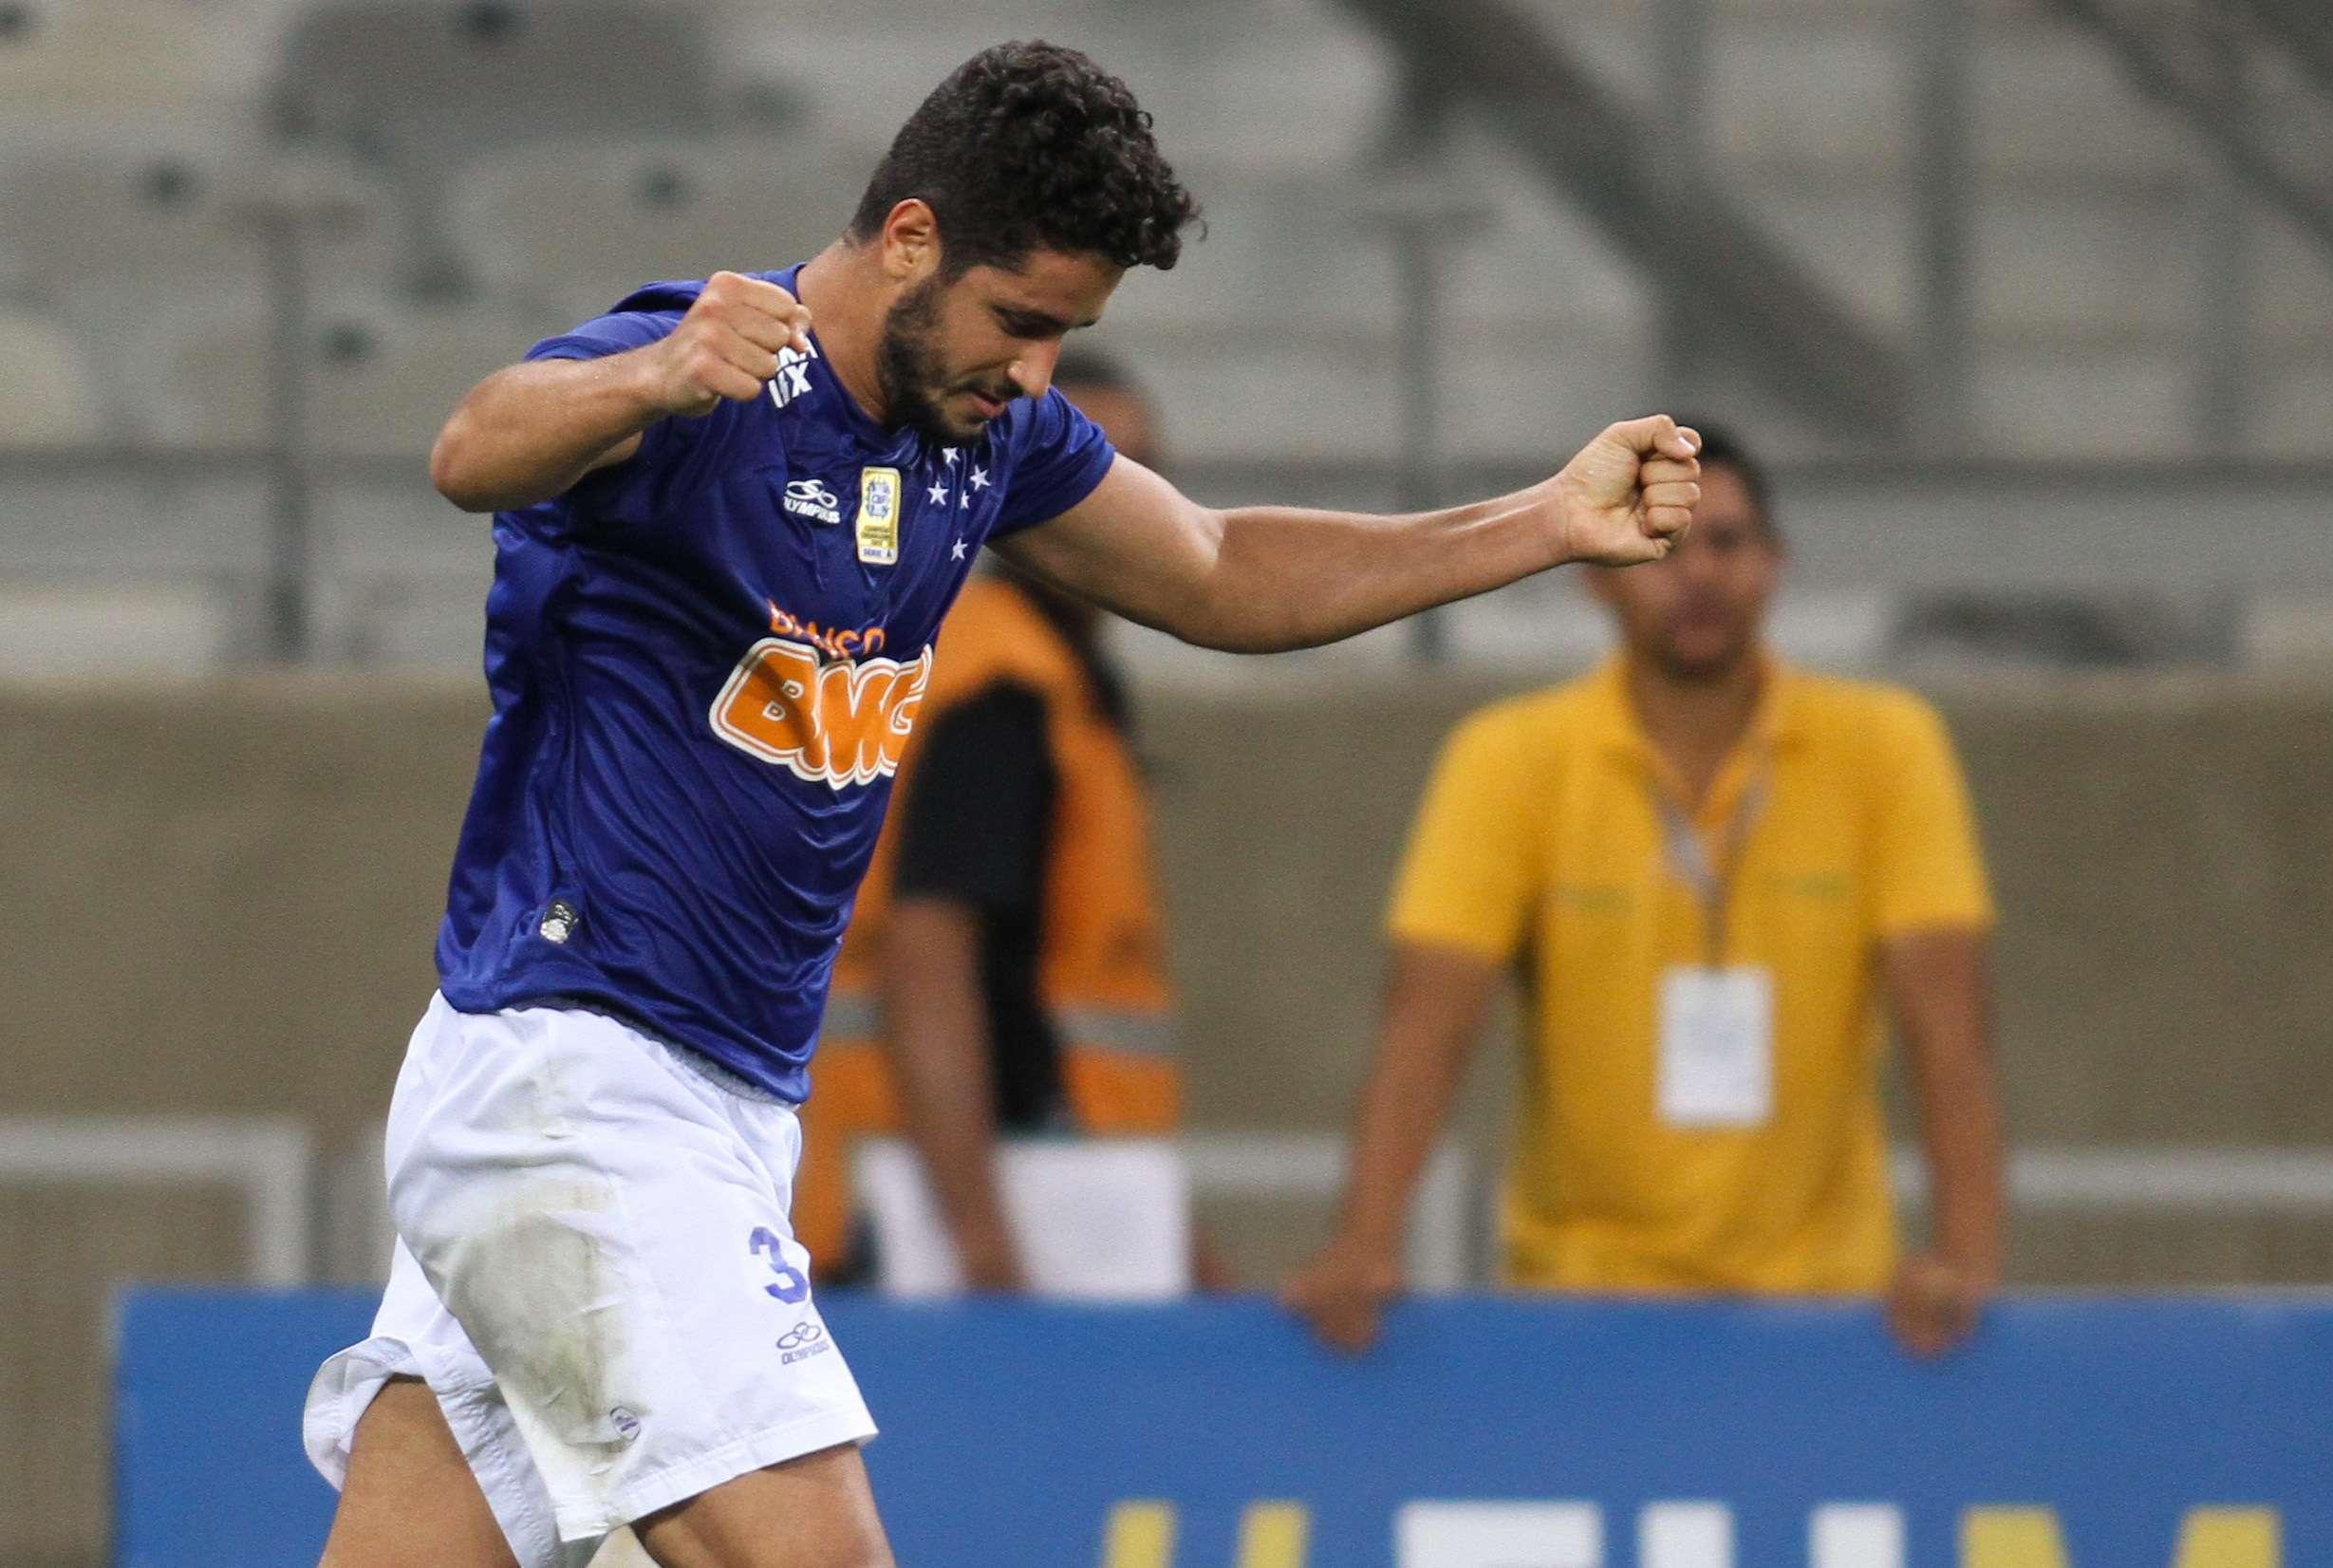 Léo fez único gol da vitória do Cruzeiro Foto: Gil Leonardi/Agência Lance